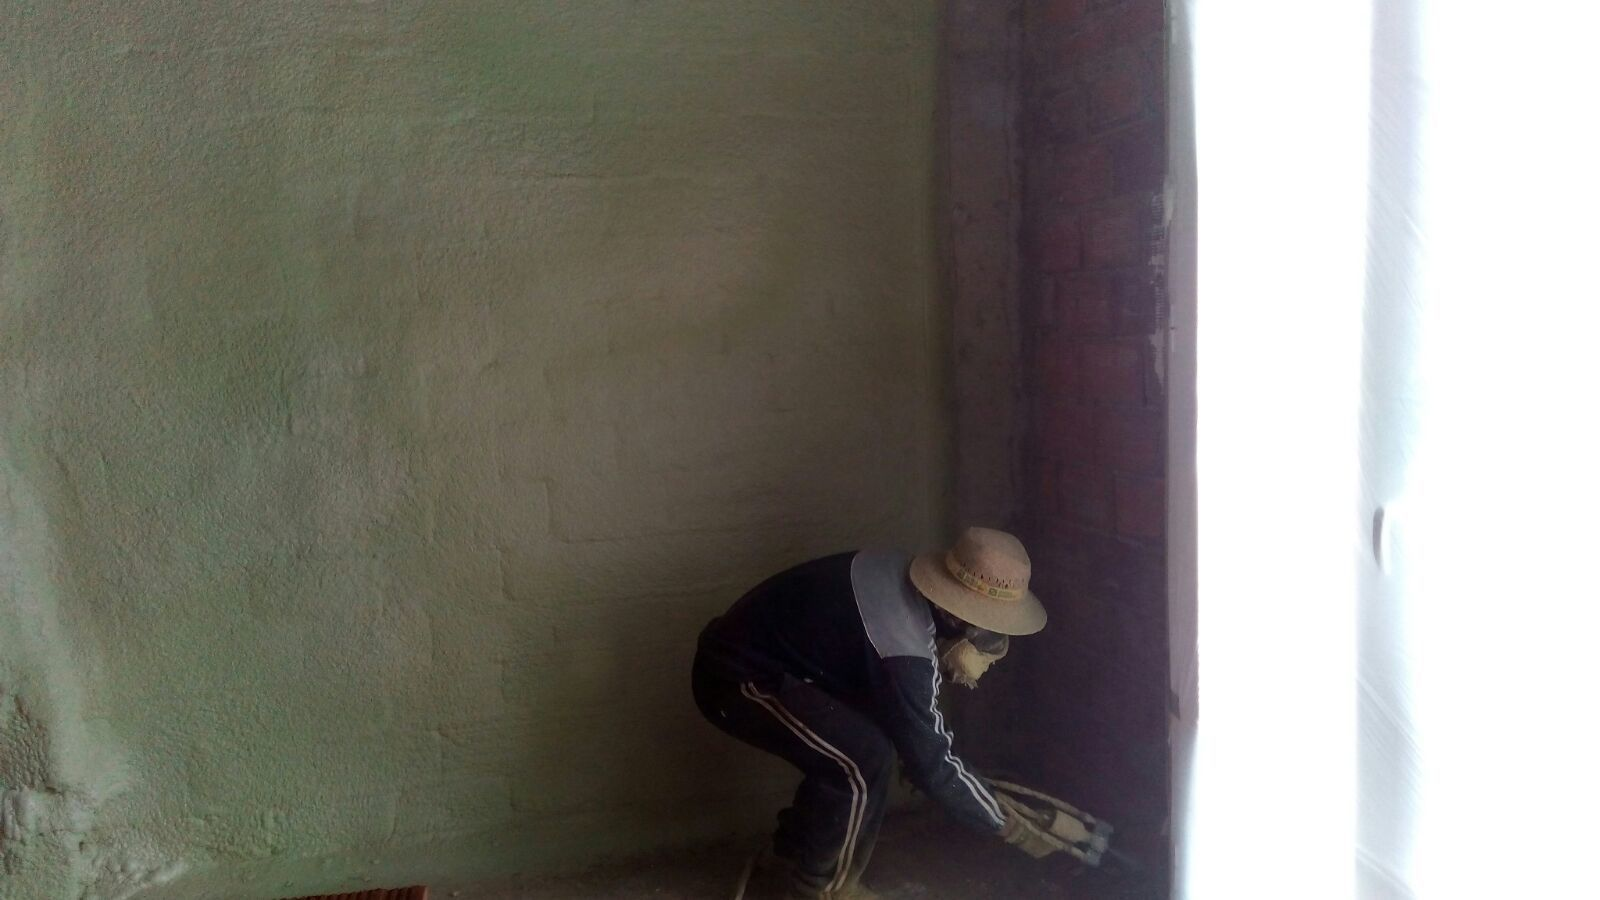 Foto 30 de Aislamientos acústicos y térmicos en Rafelcofer | Aislamientos de Poliuretano Jaime Femenia